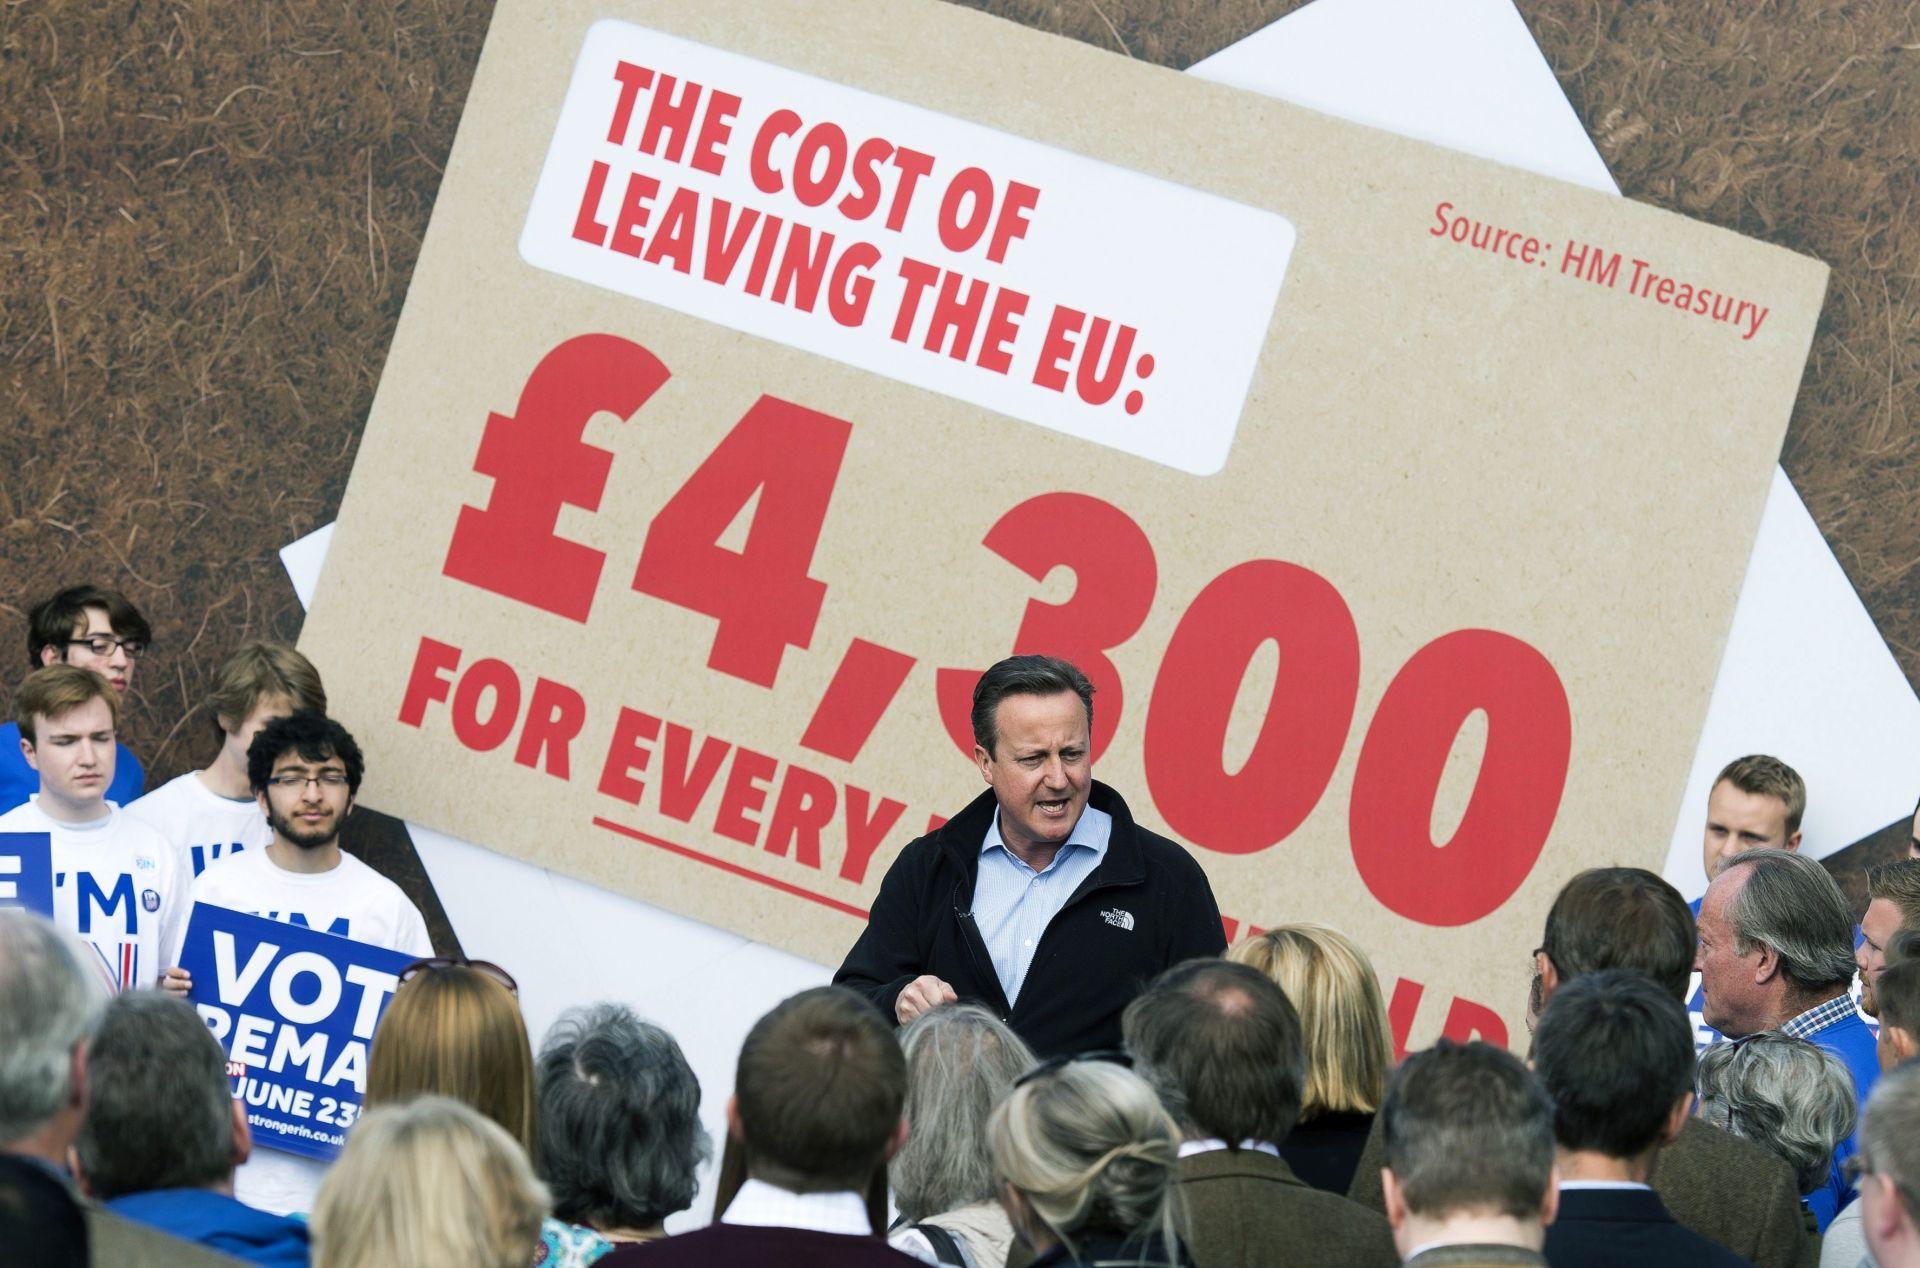 BREXIT: Zagovornici izlaska iz EU ljutiti na kompaniju Ryanair